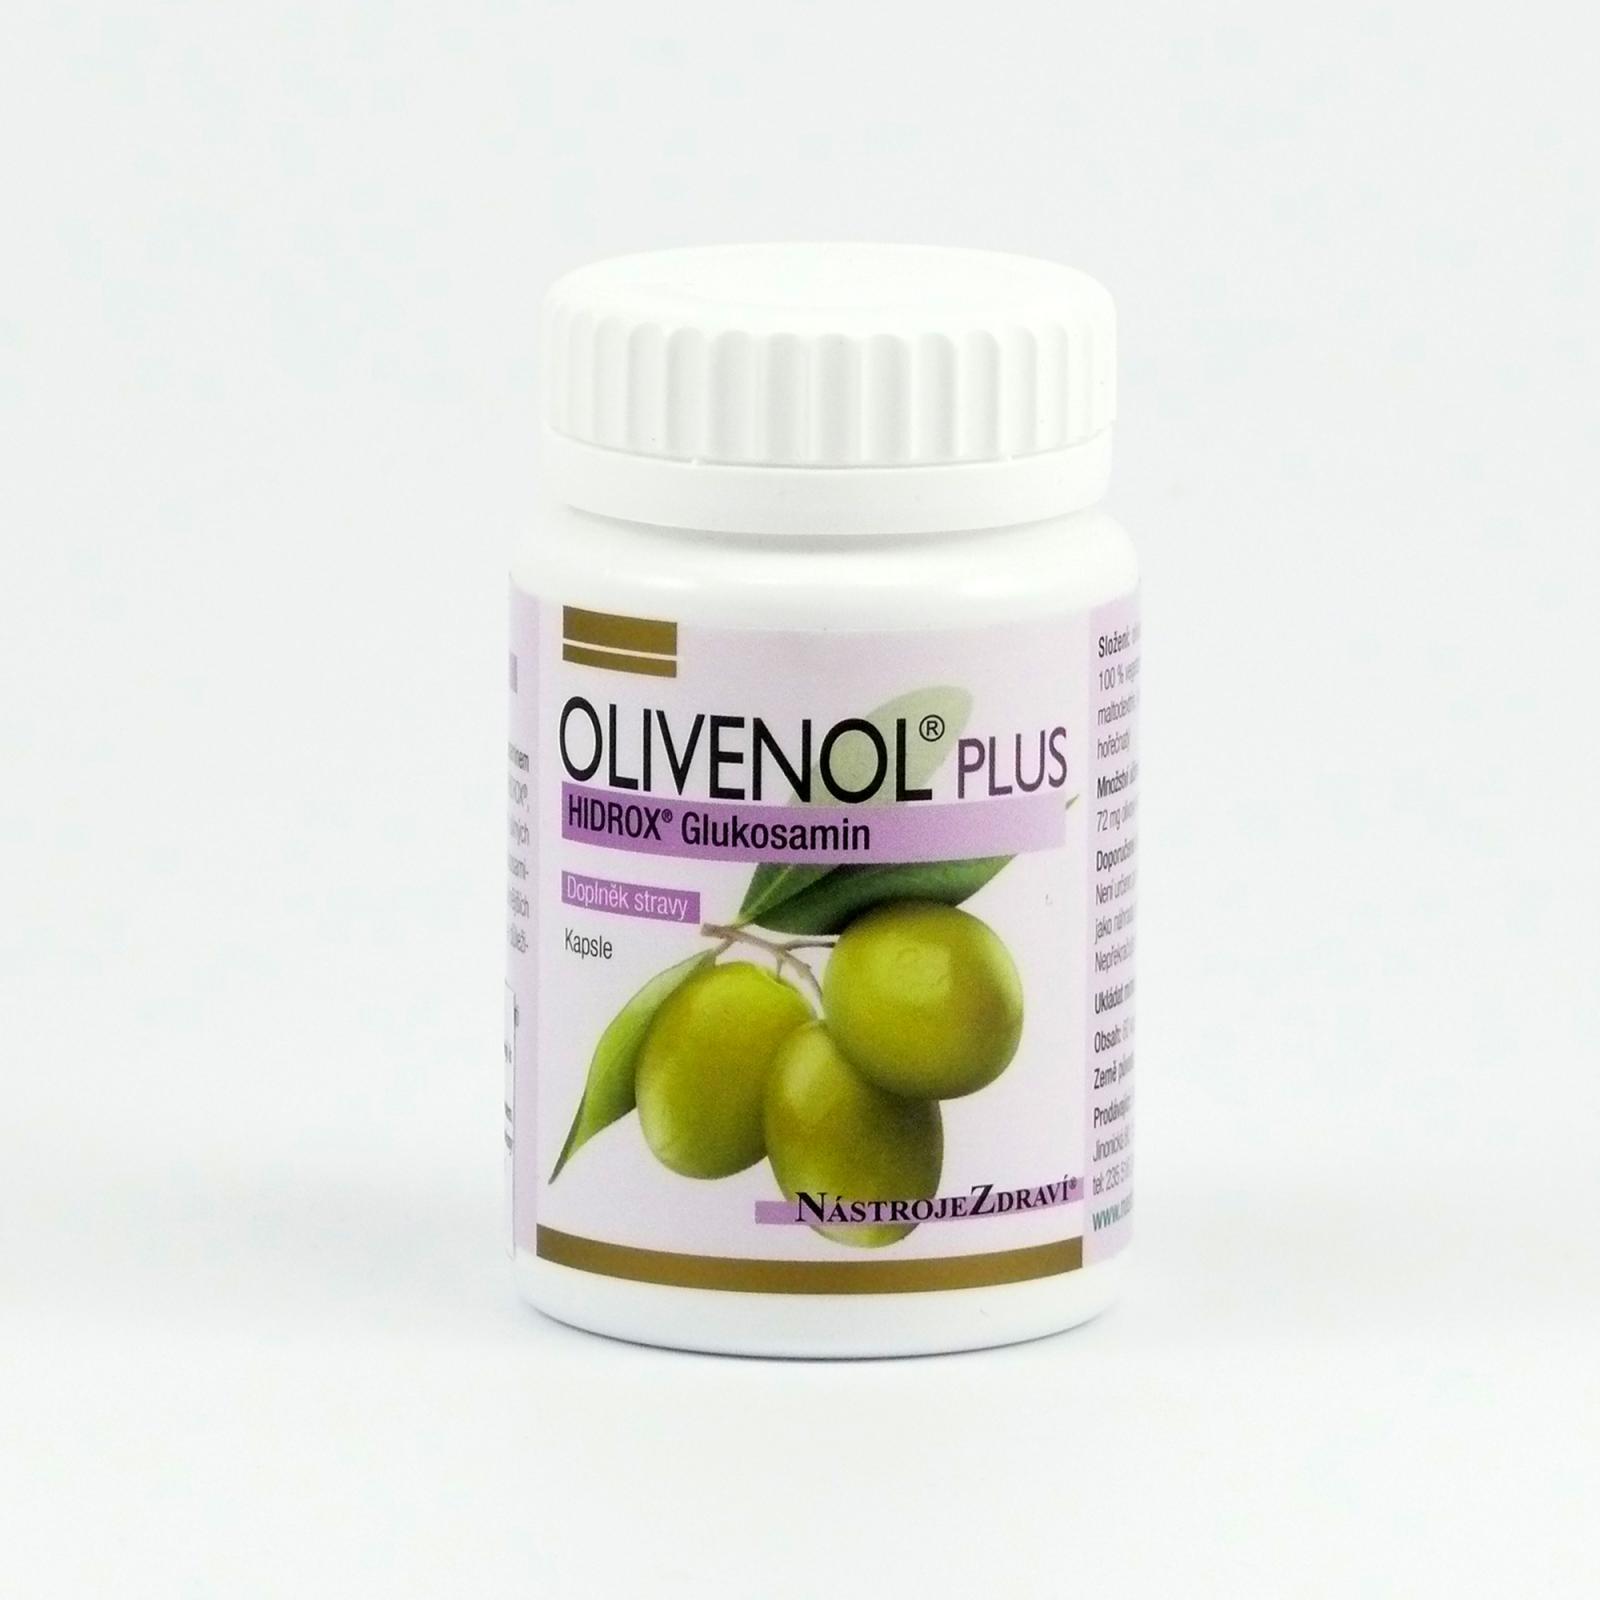 Nástroje Zdraví Olivenol Plus Hidrox Glukosamin 60 kapslí